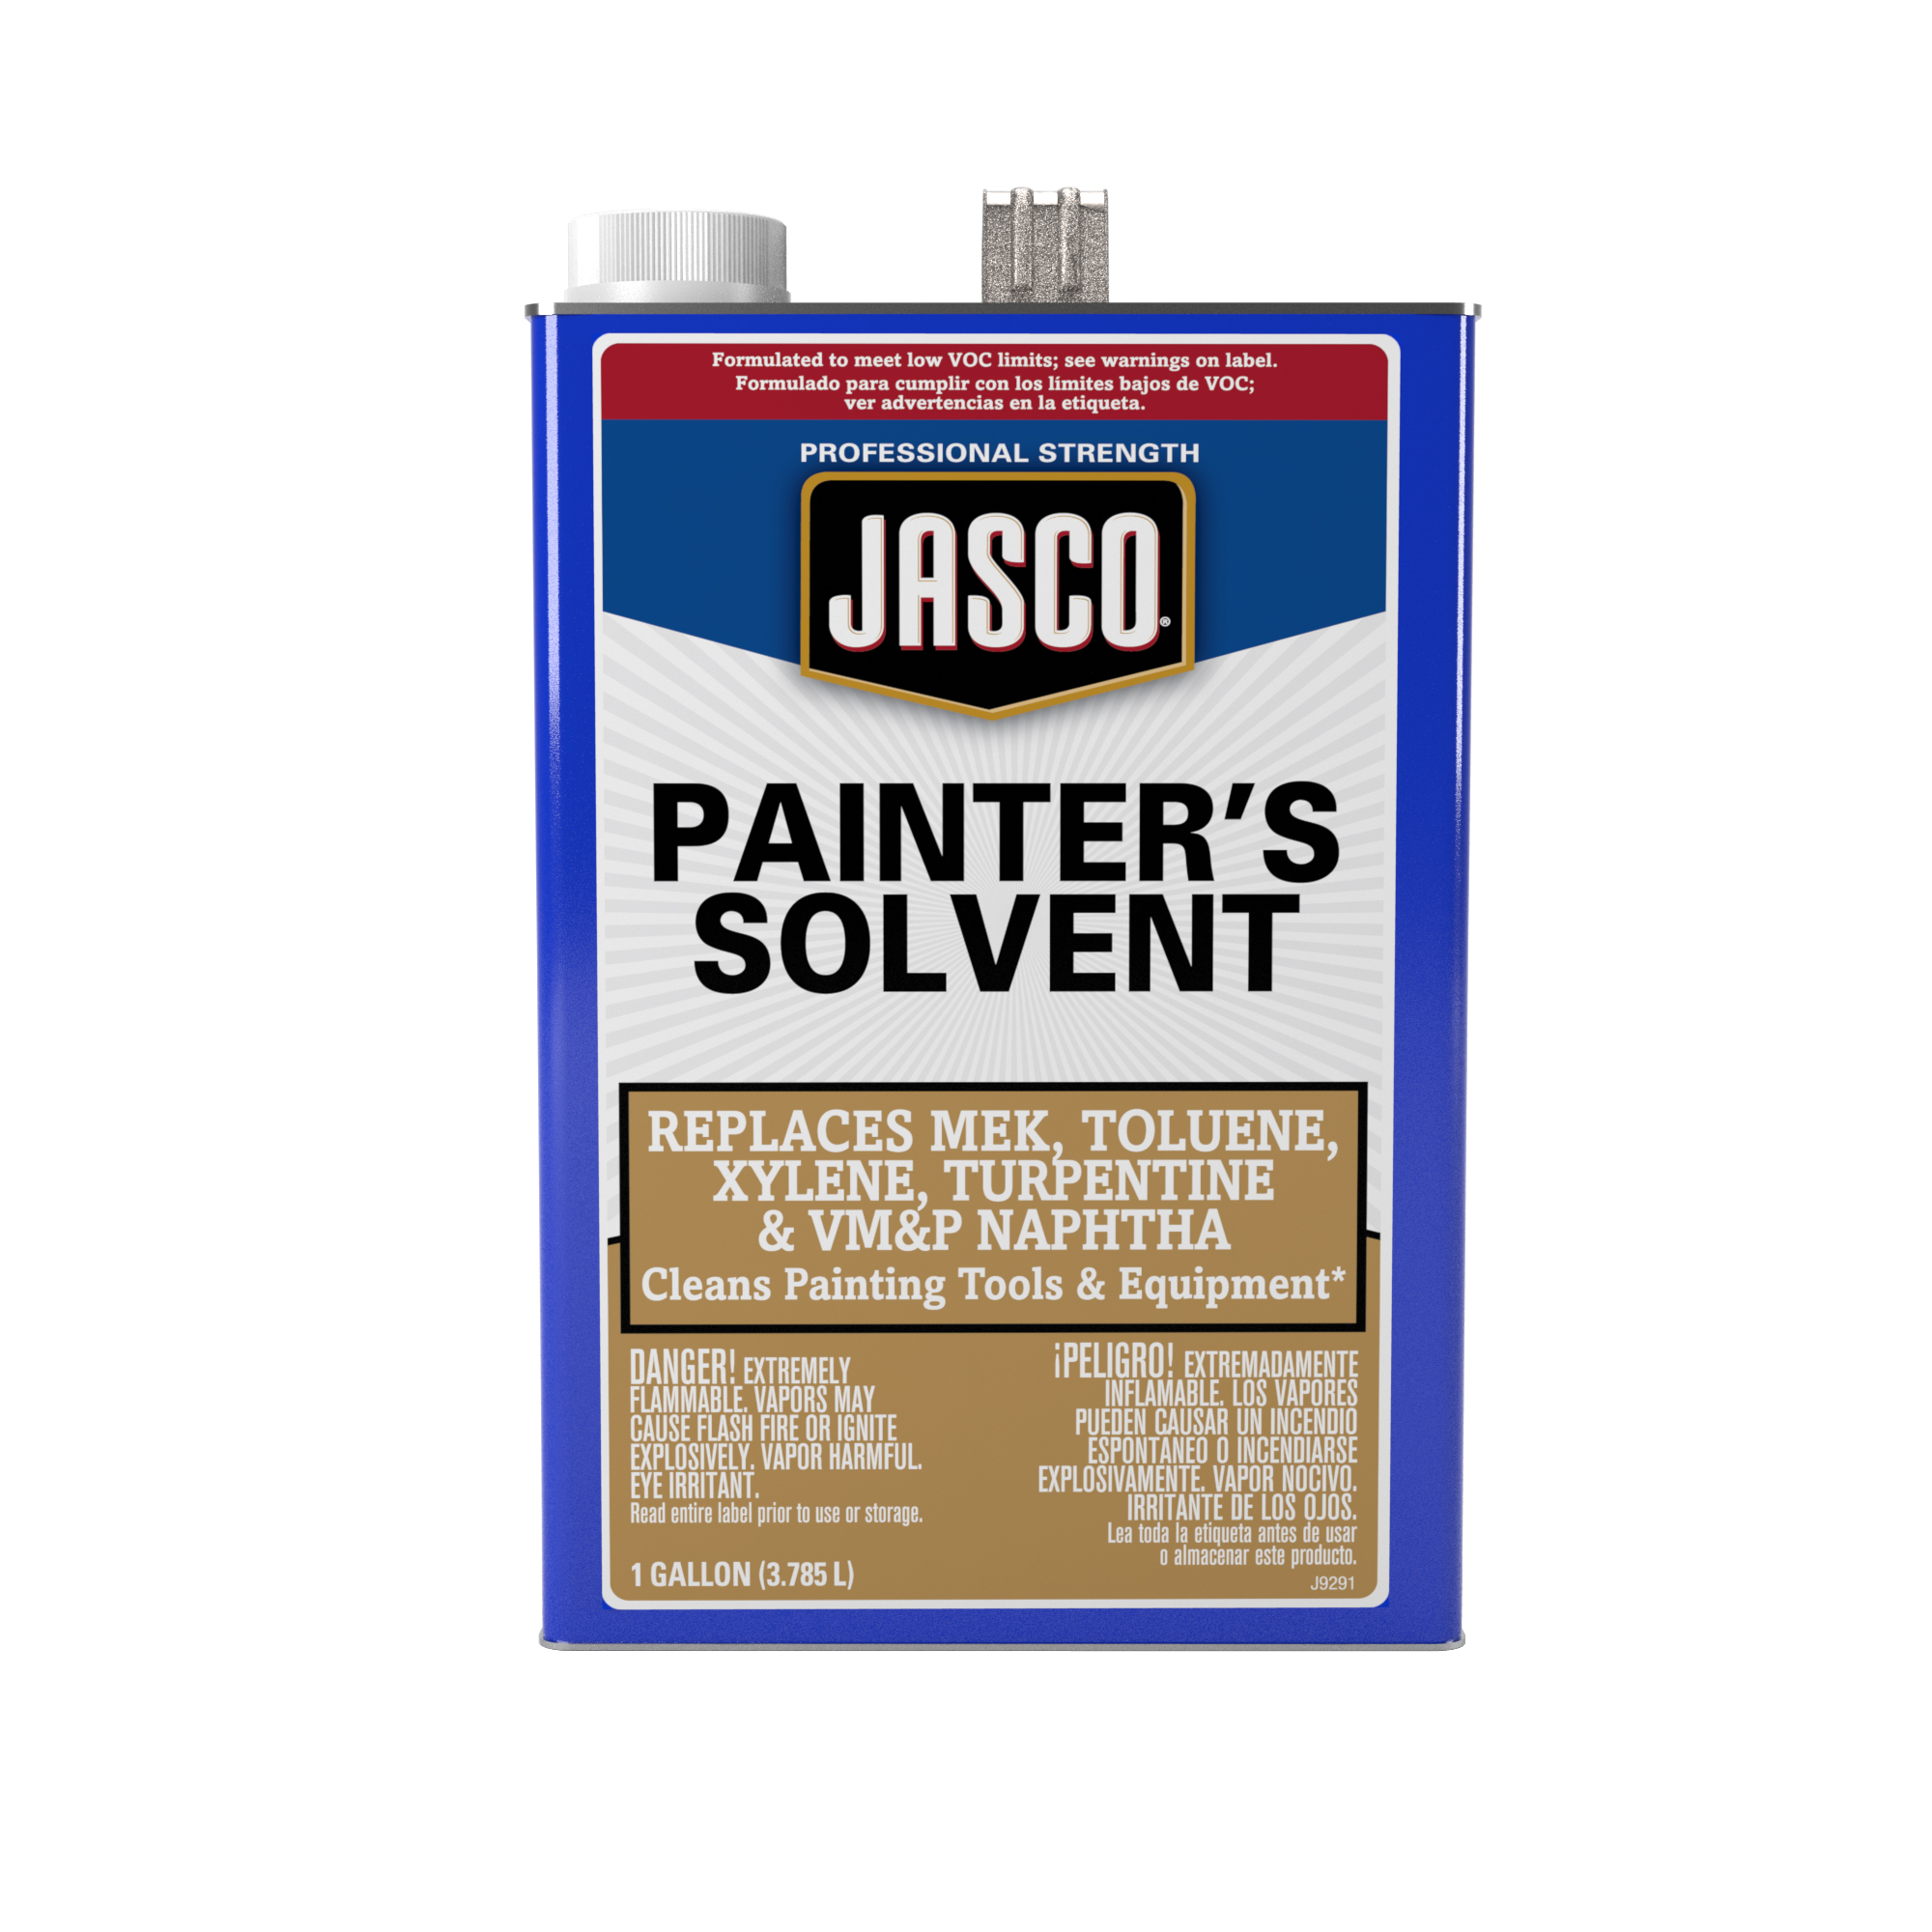 Painters Solvent